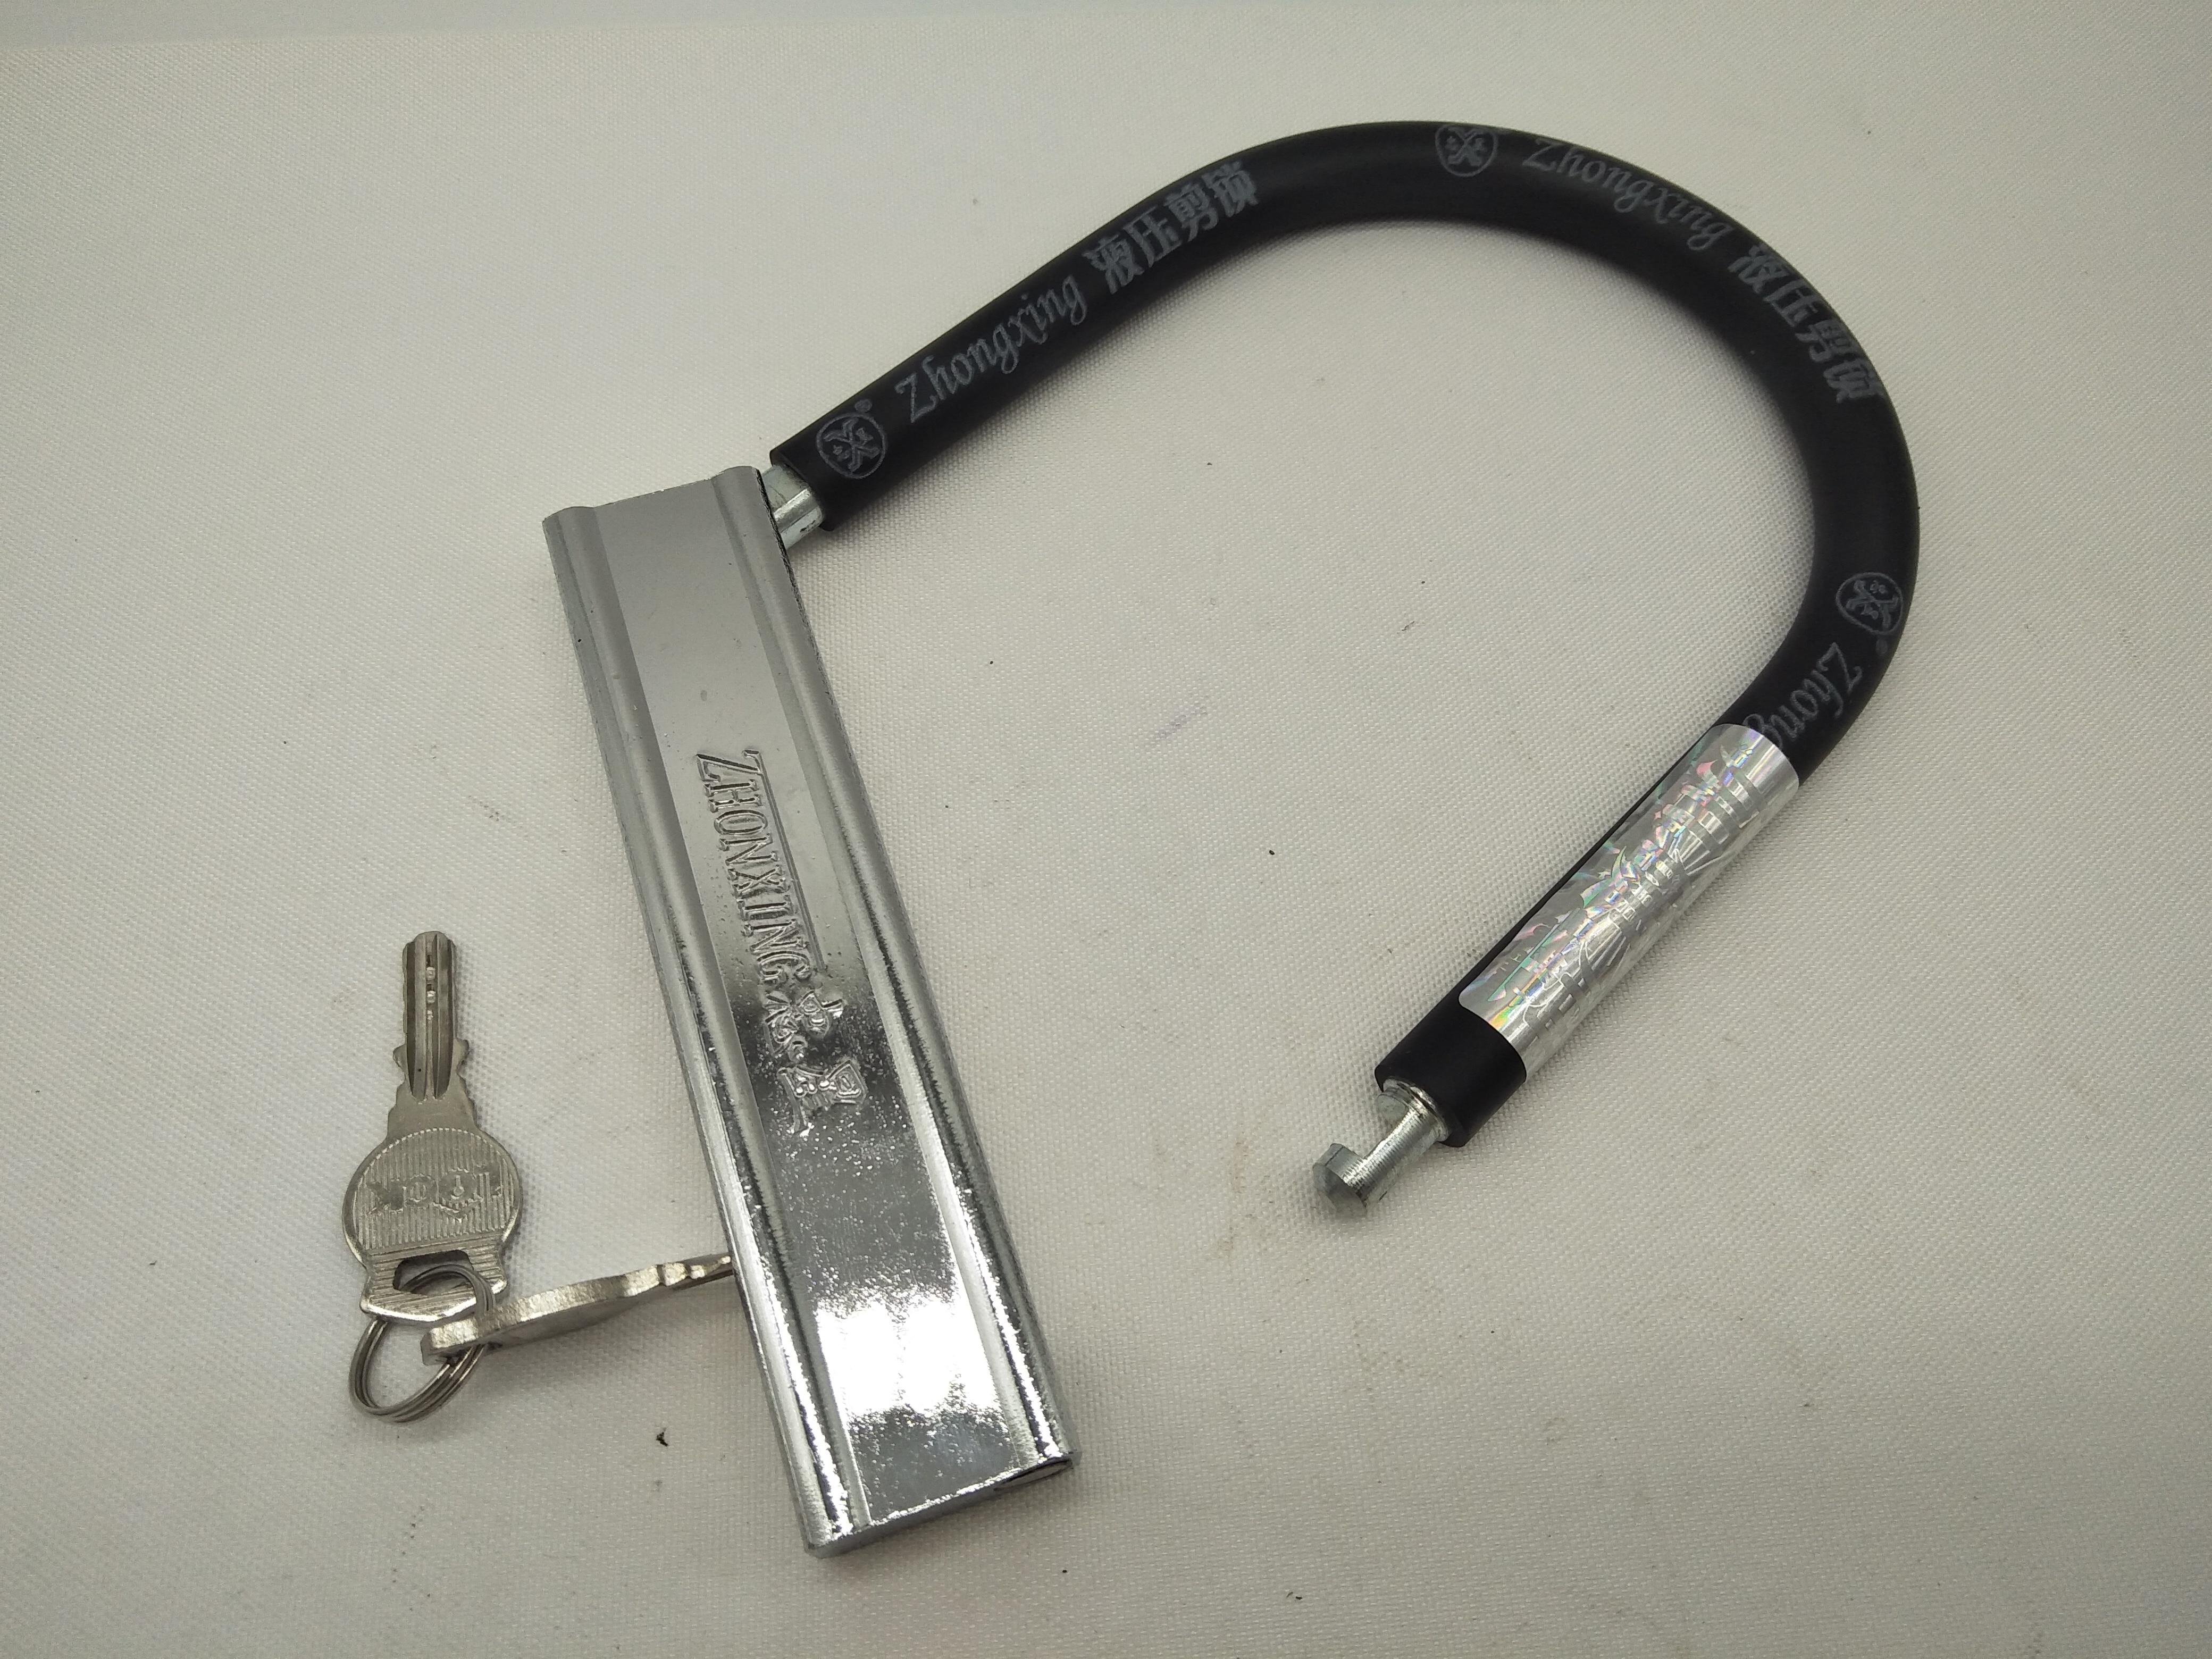 A305 Professional Smart Waterproof Mechanical U-lock Stainless Steel Bike Motorcycle Anti-hydraulic Protection Lock